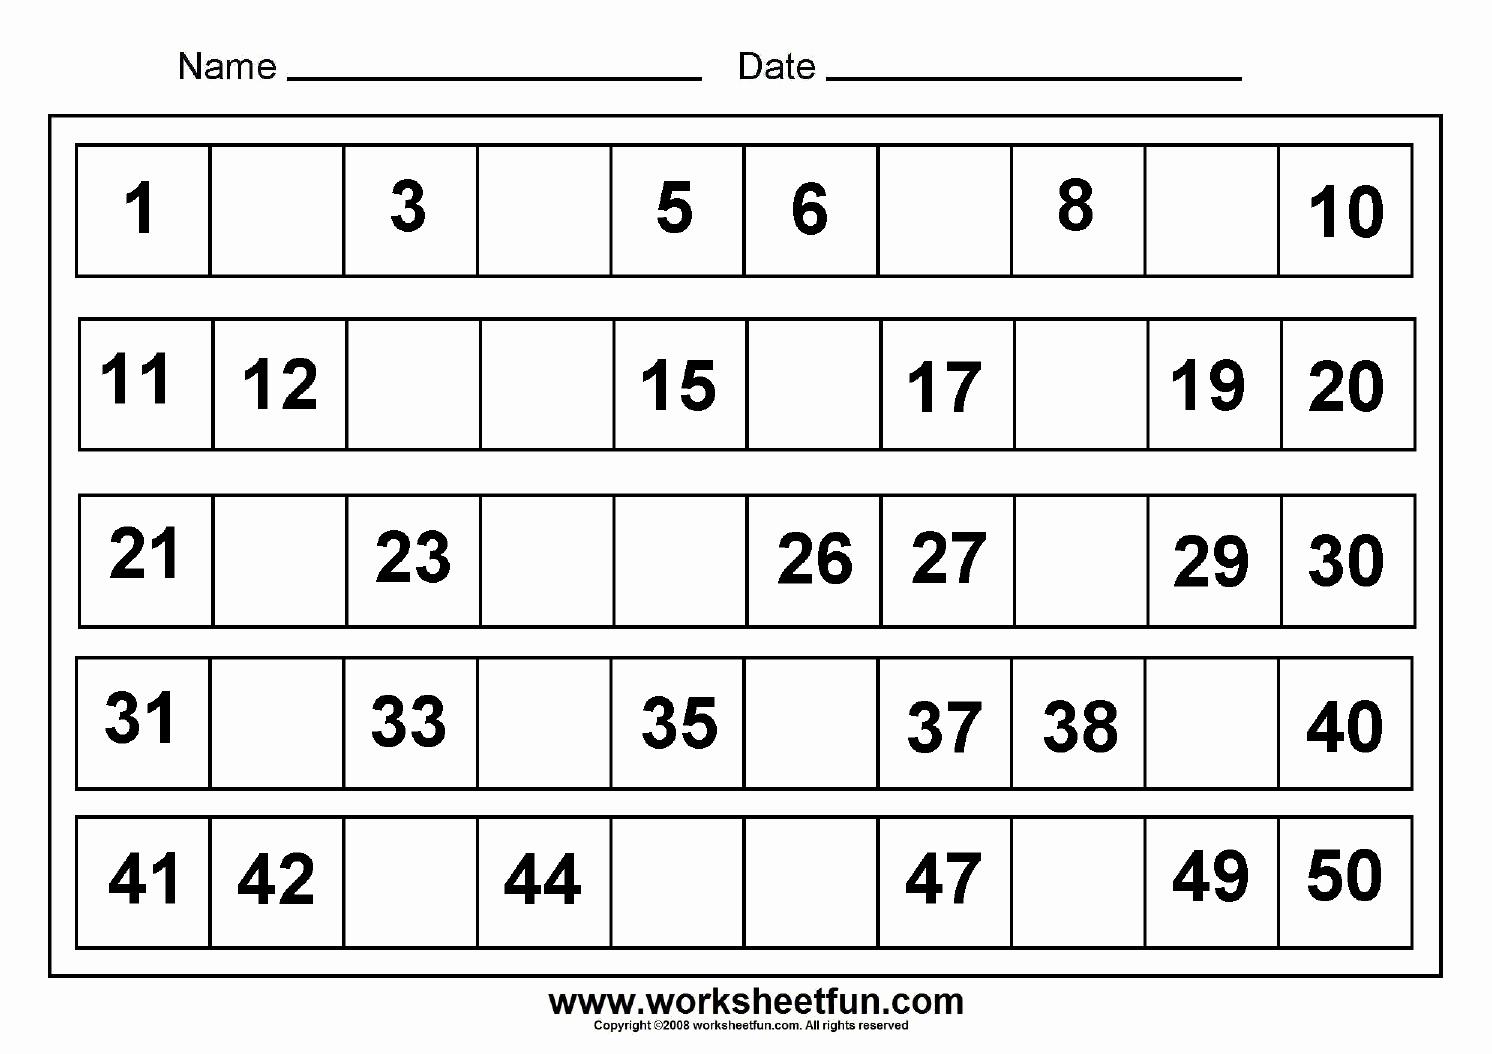 Missing Number Worksheets 1 20 Elegant Missing Numbers Worksheets 1 20